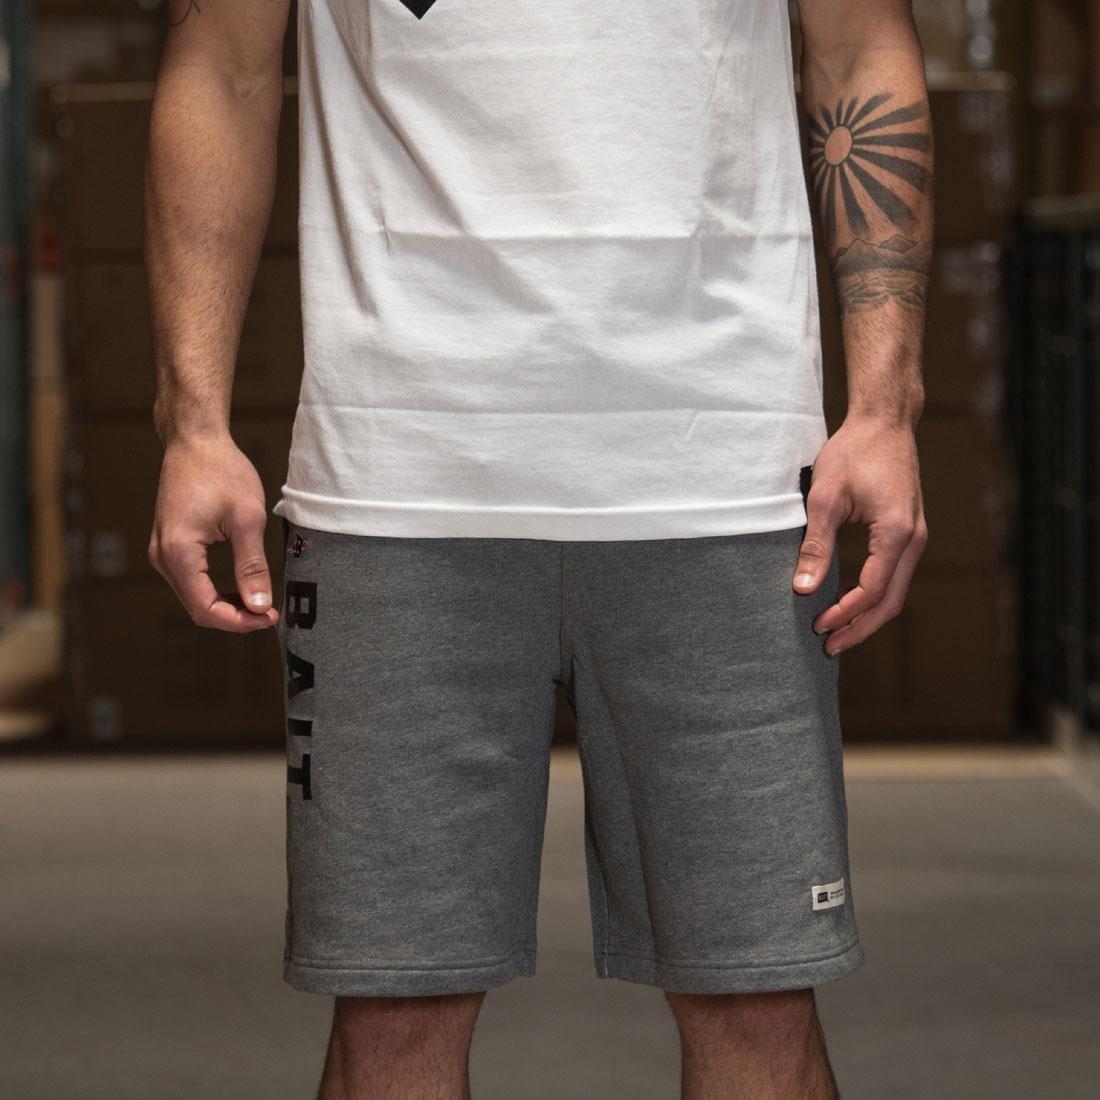 BAIT Basics Sweat Shorts (gray)